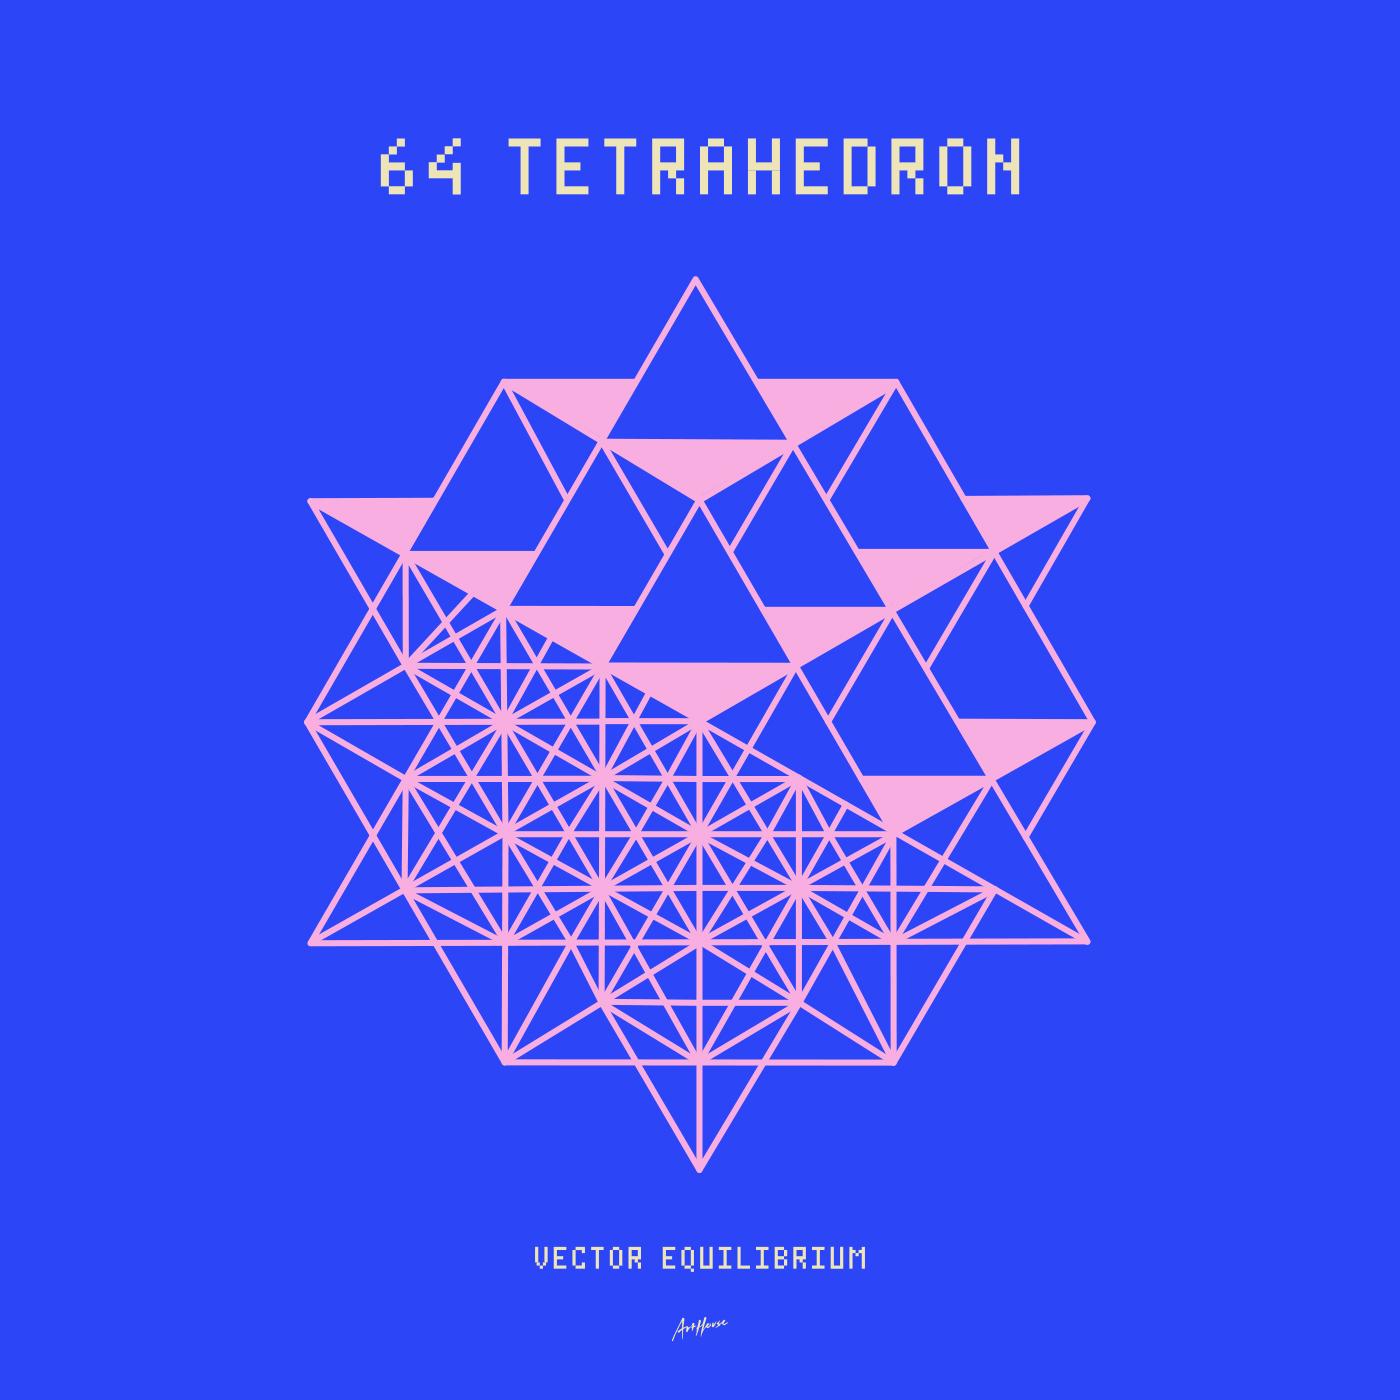 64 Tetrahedron Vector Equilibrium